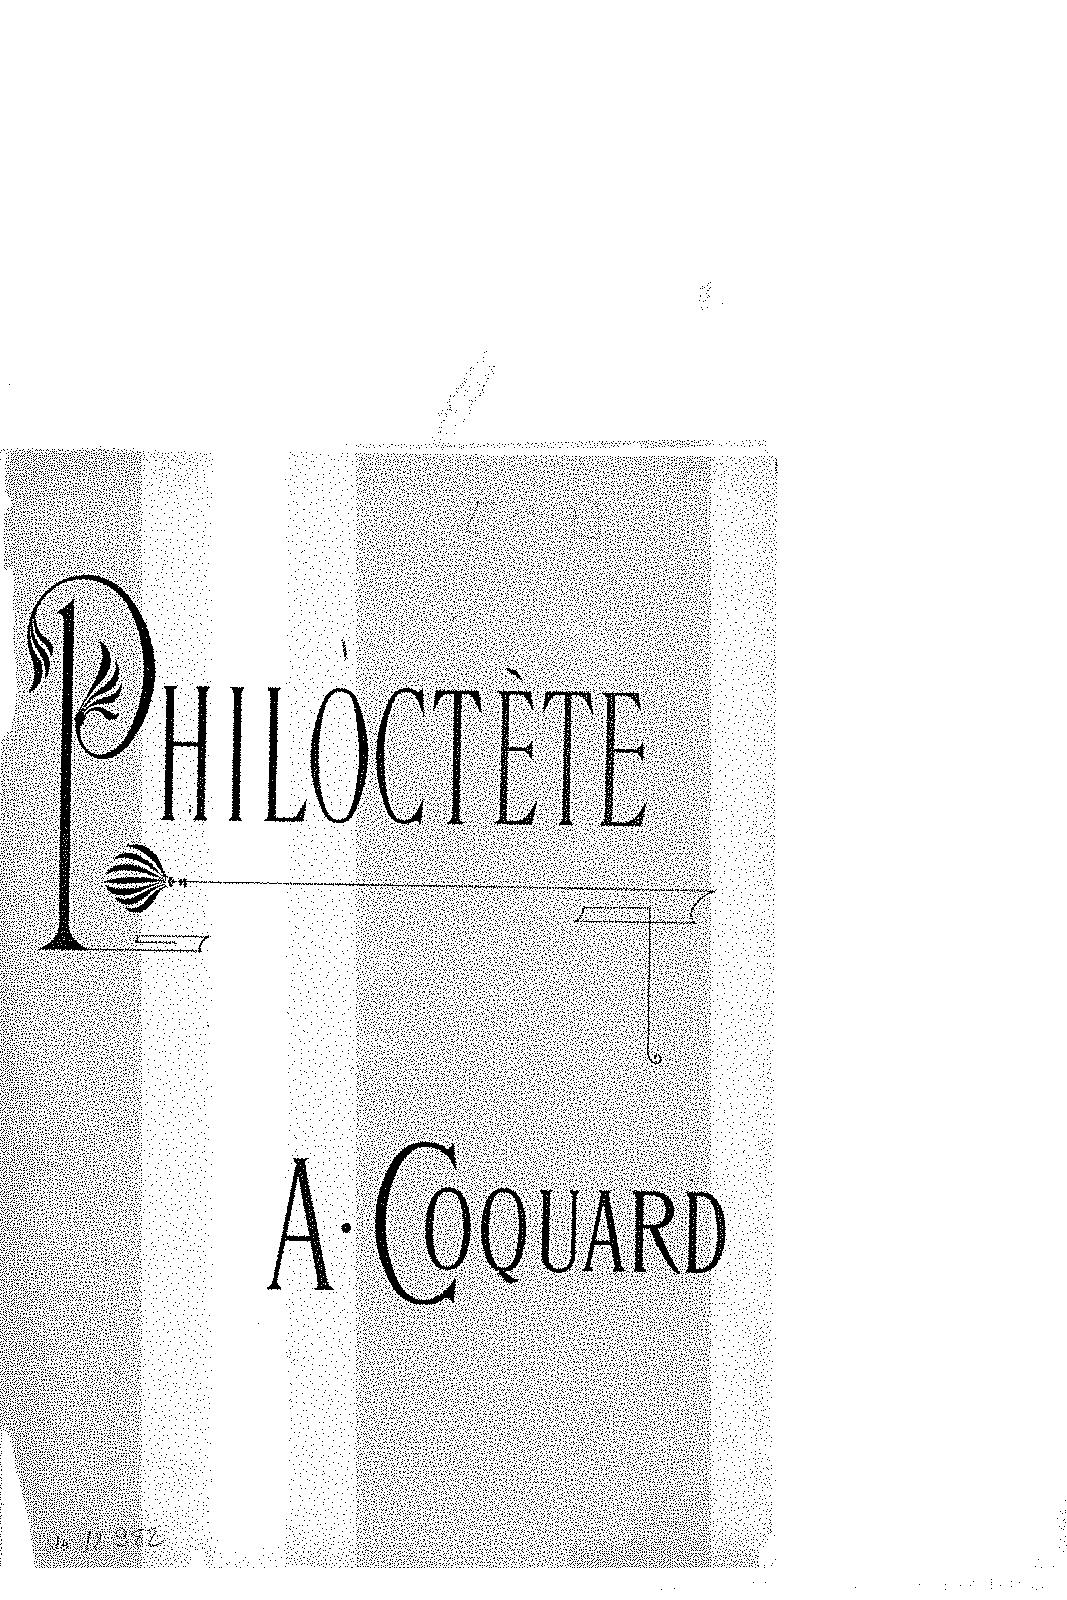 Philoctète (Coquard, Arthur) - IMSLP/Petrucci Music Library: Free